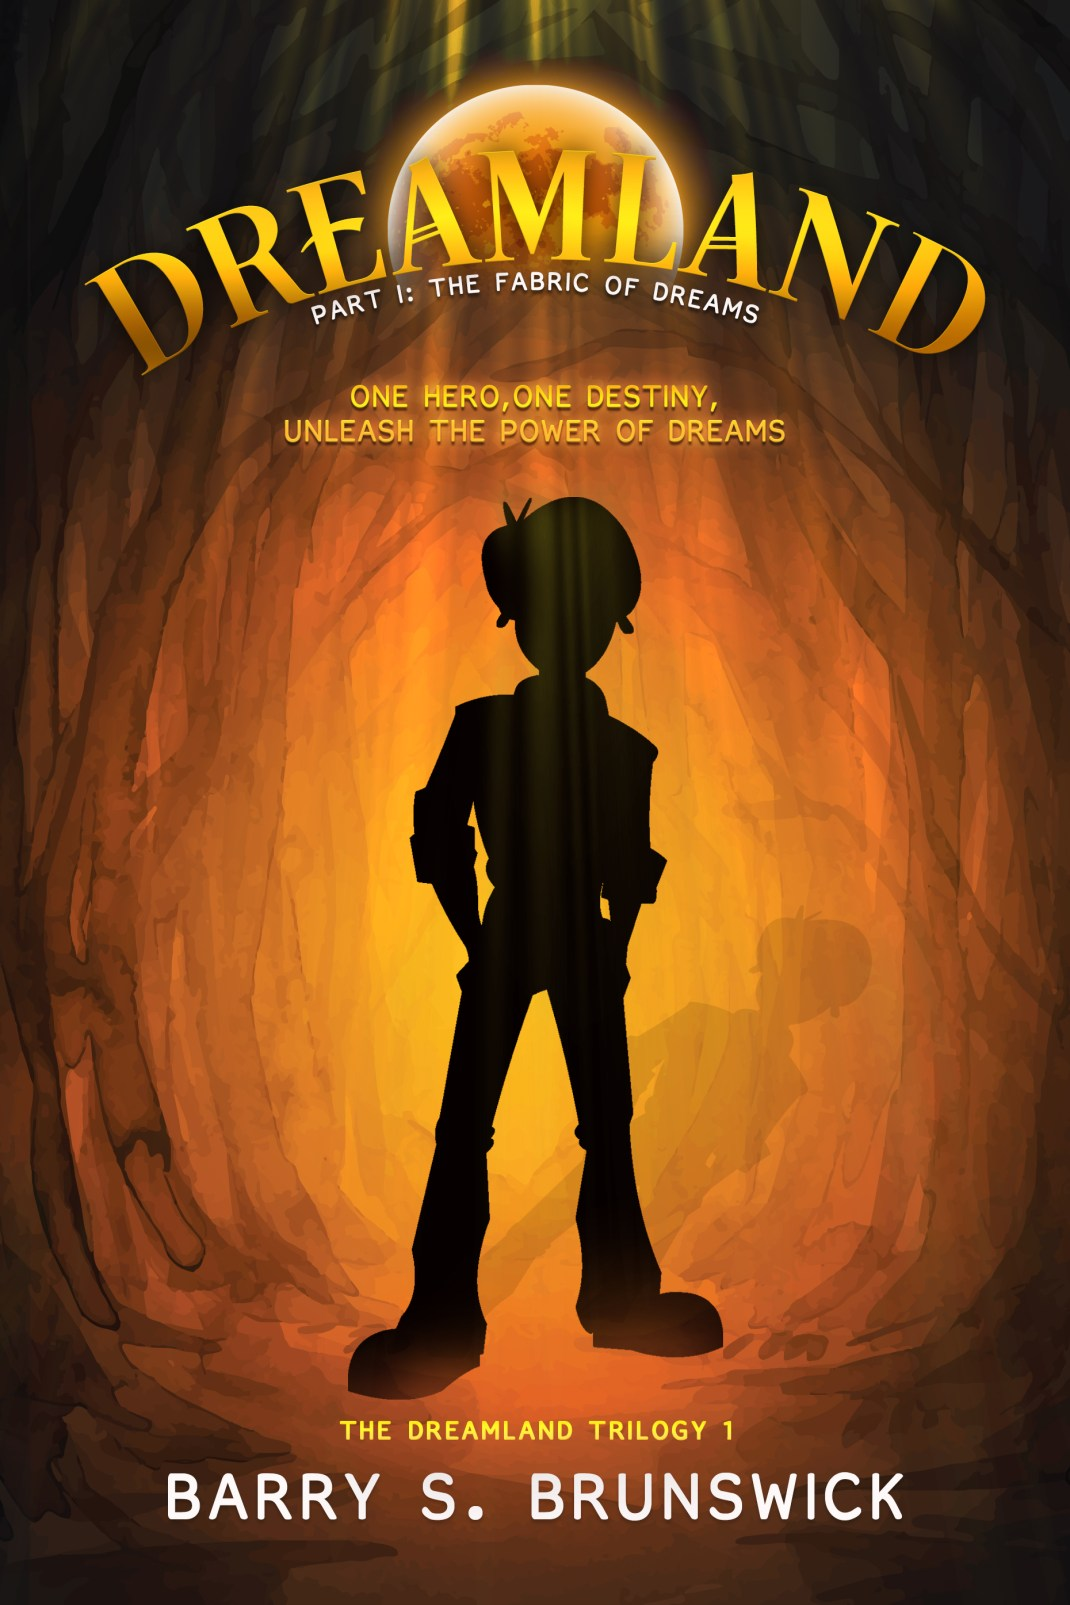 Barry S. Brunswick The Dreamland Trilogy